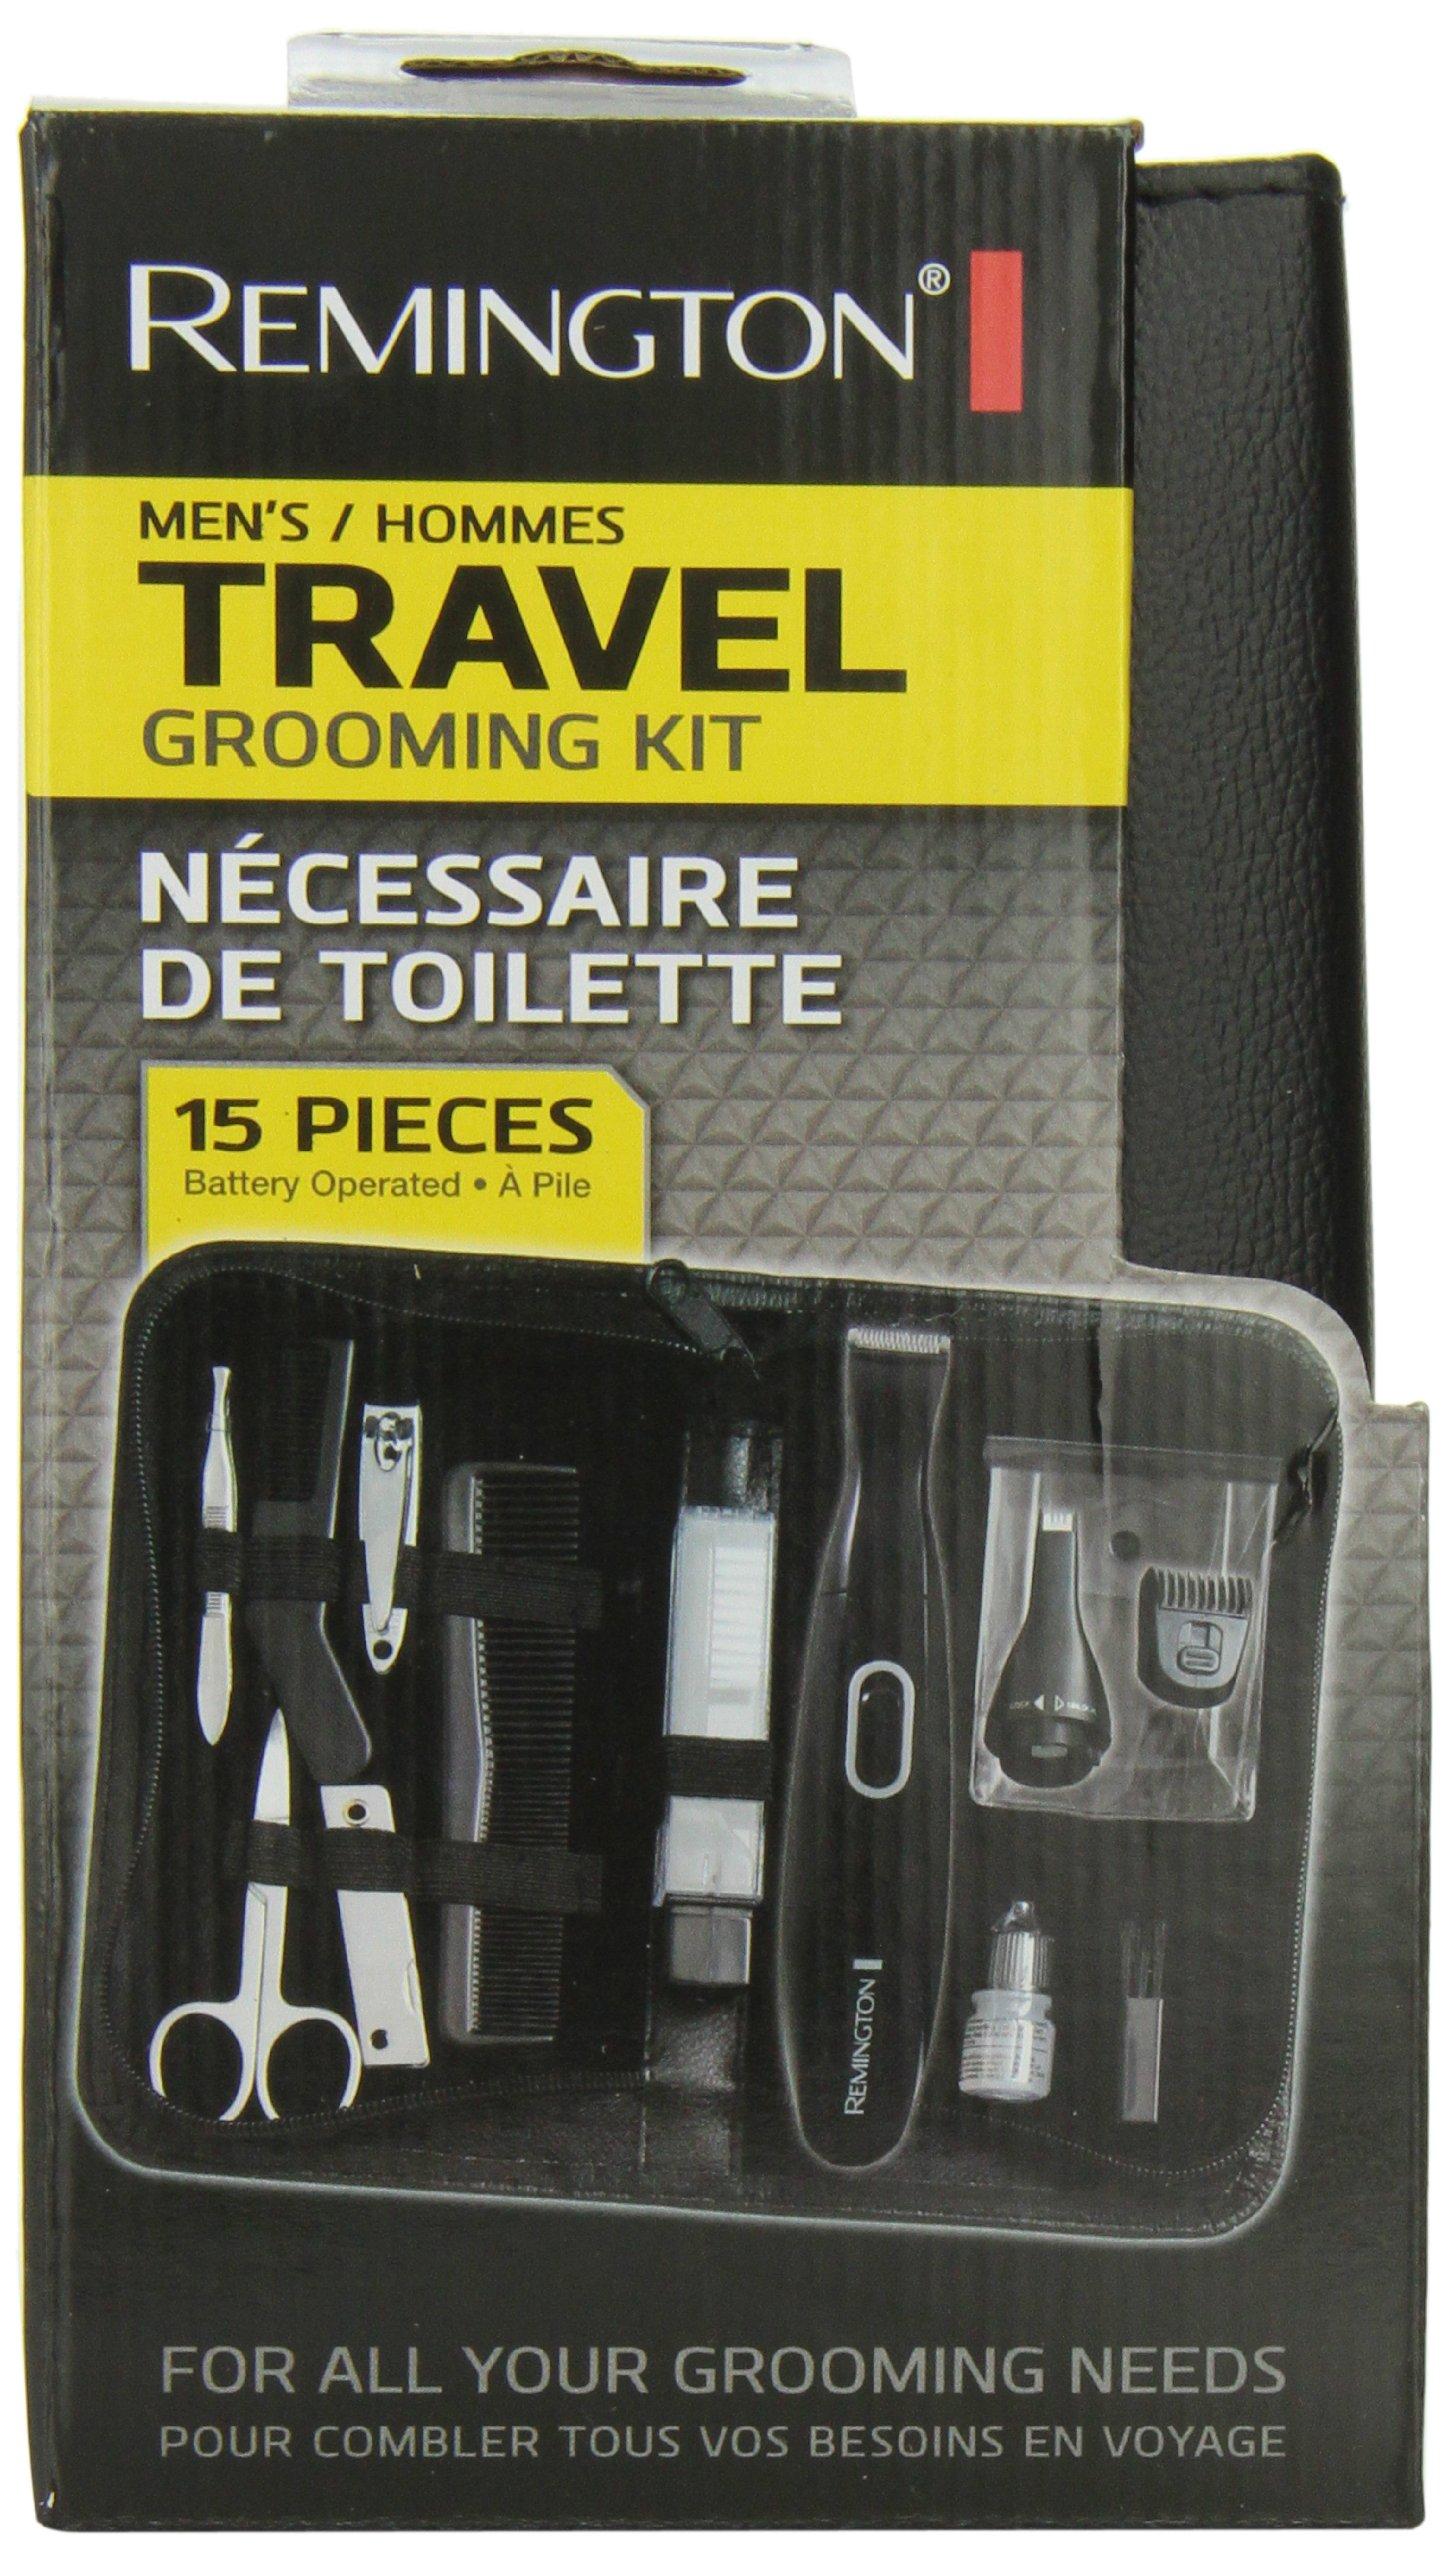 Remington TLG-100ACDN Precision Grooming Travel Kit, Black